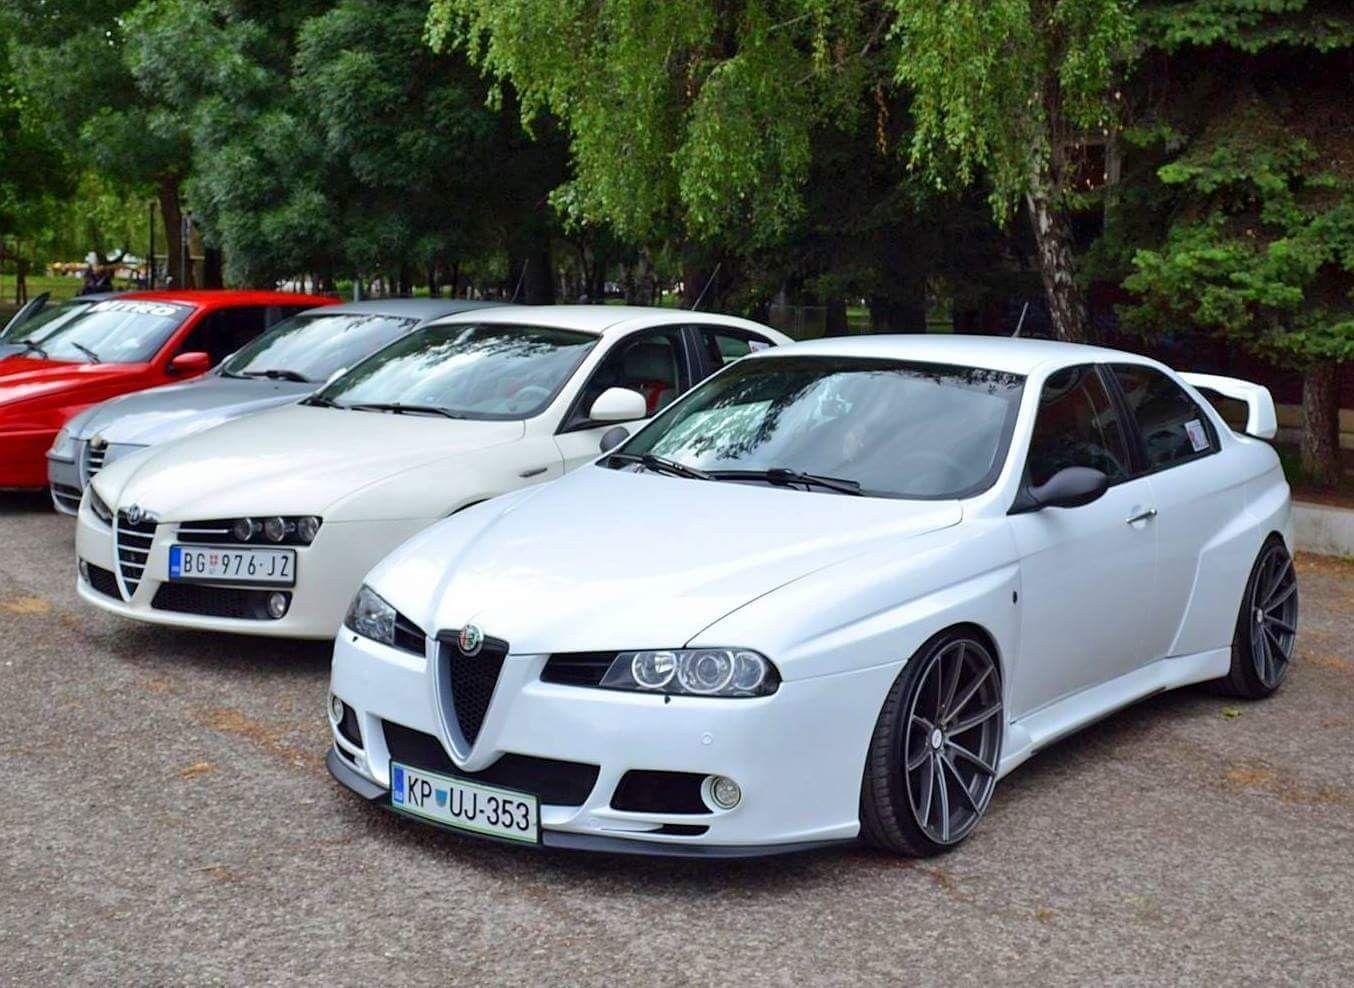 Romeo Alfa 156 147Classic 156159amp; Cars 3ASjLc4q5R